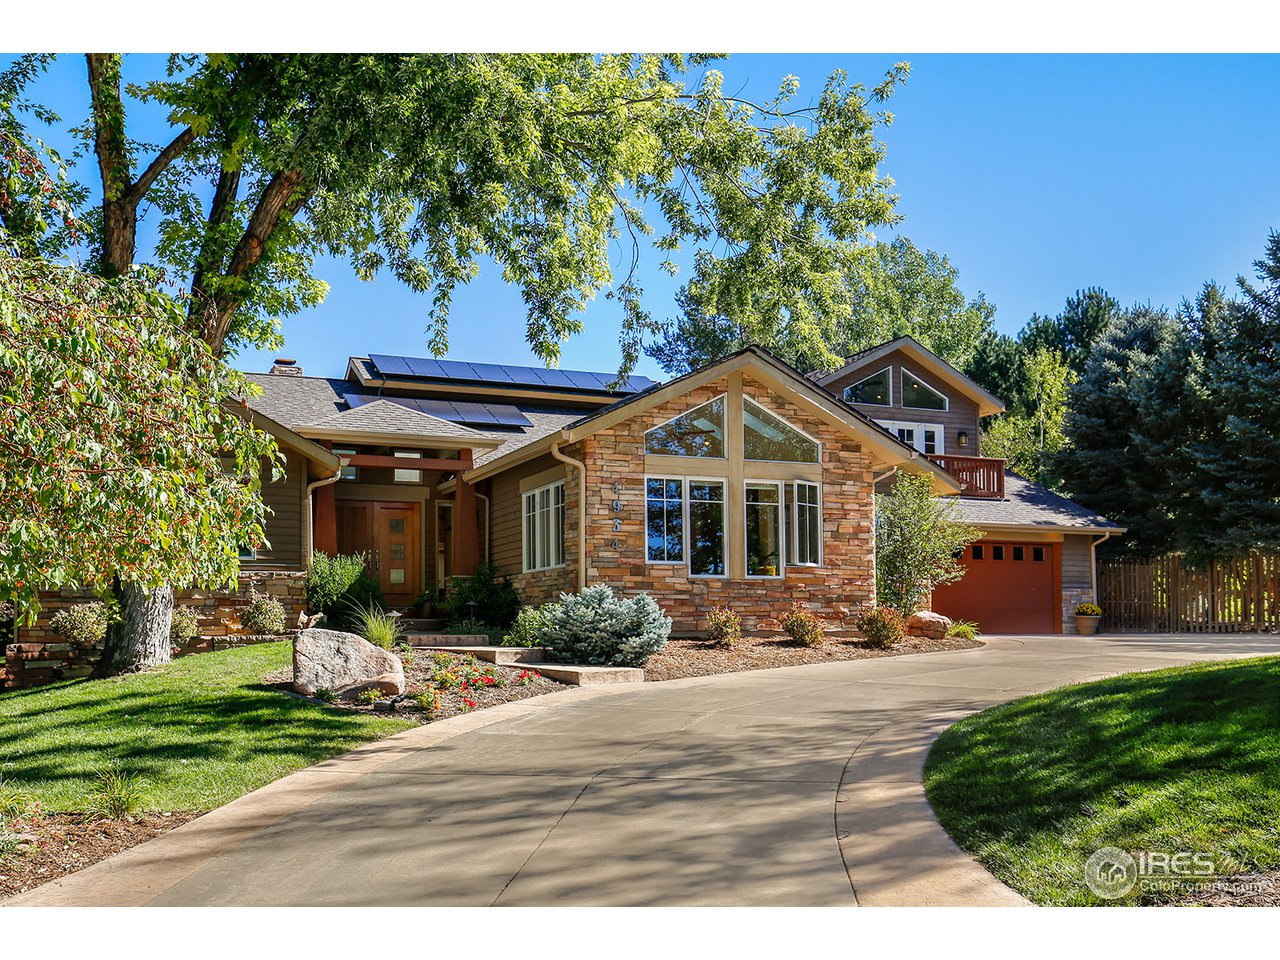 4934 Idylwild Trl, Boulder CO 80301